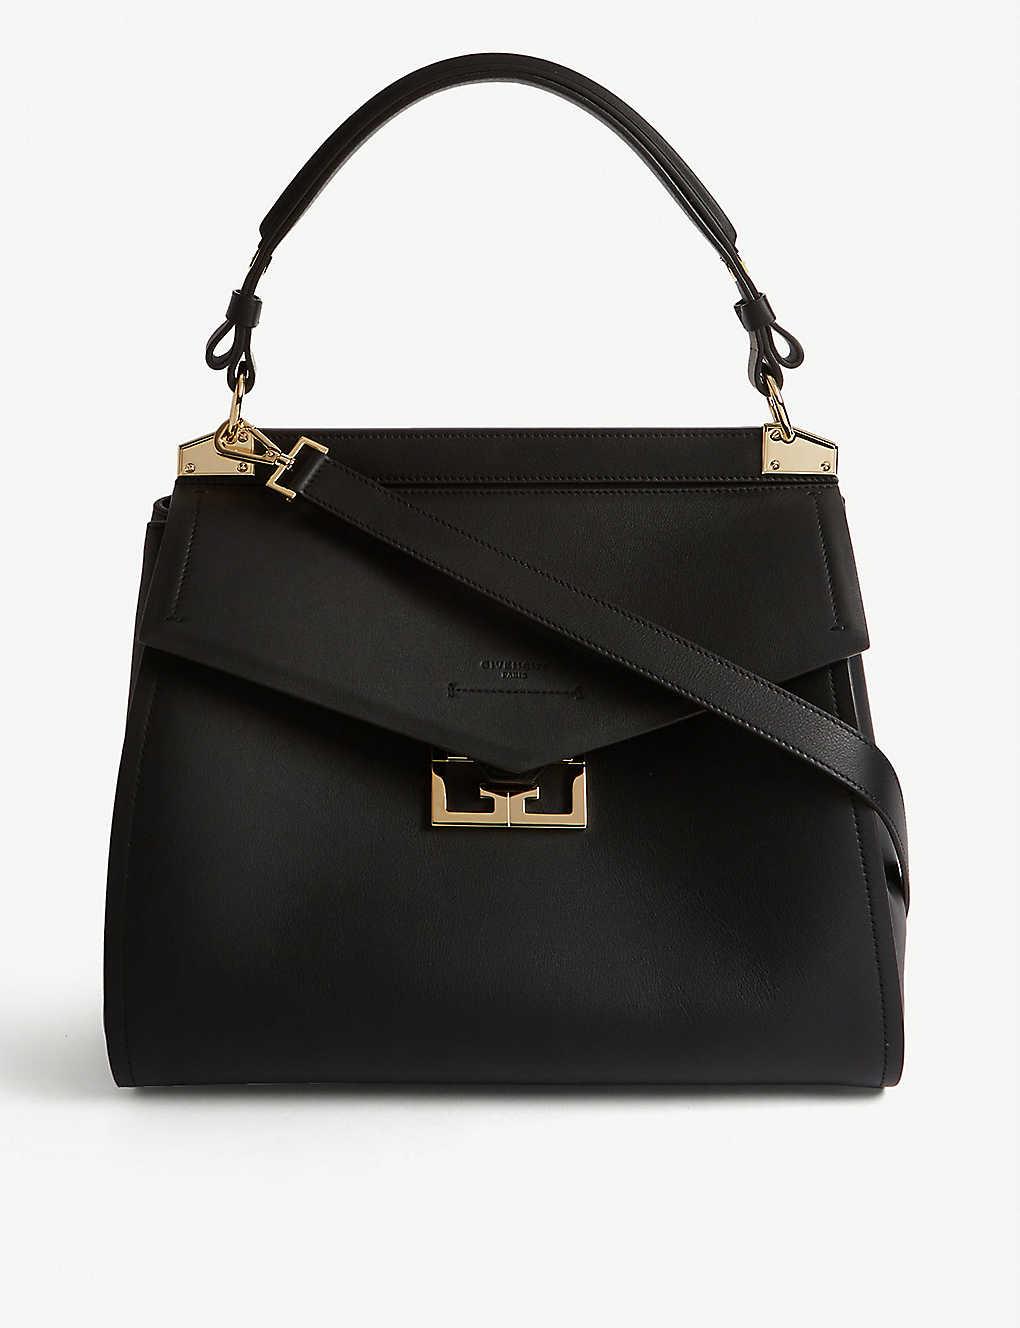 196cfe90158 GIVENCHY - Mystic large leather top handle bag | Selfridges.com